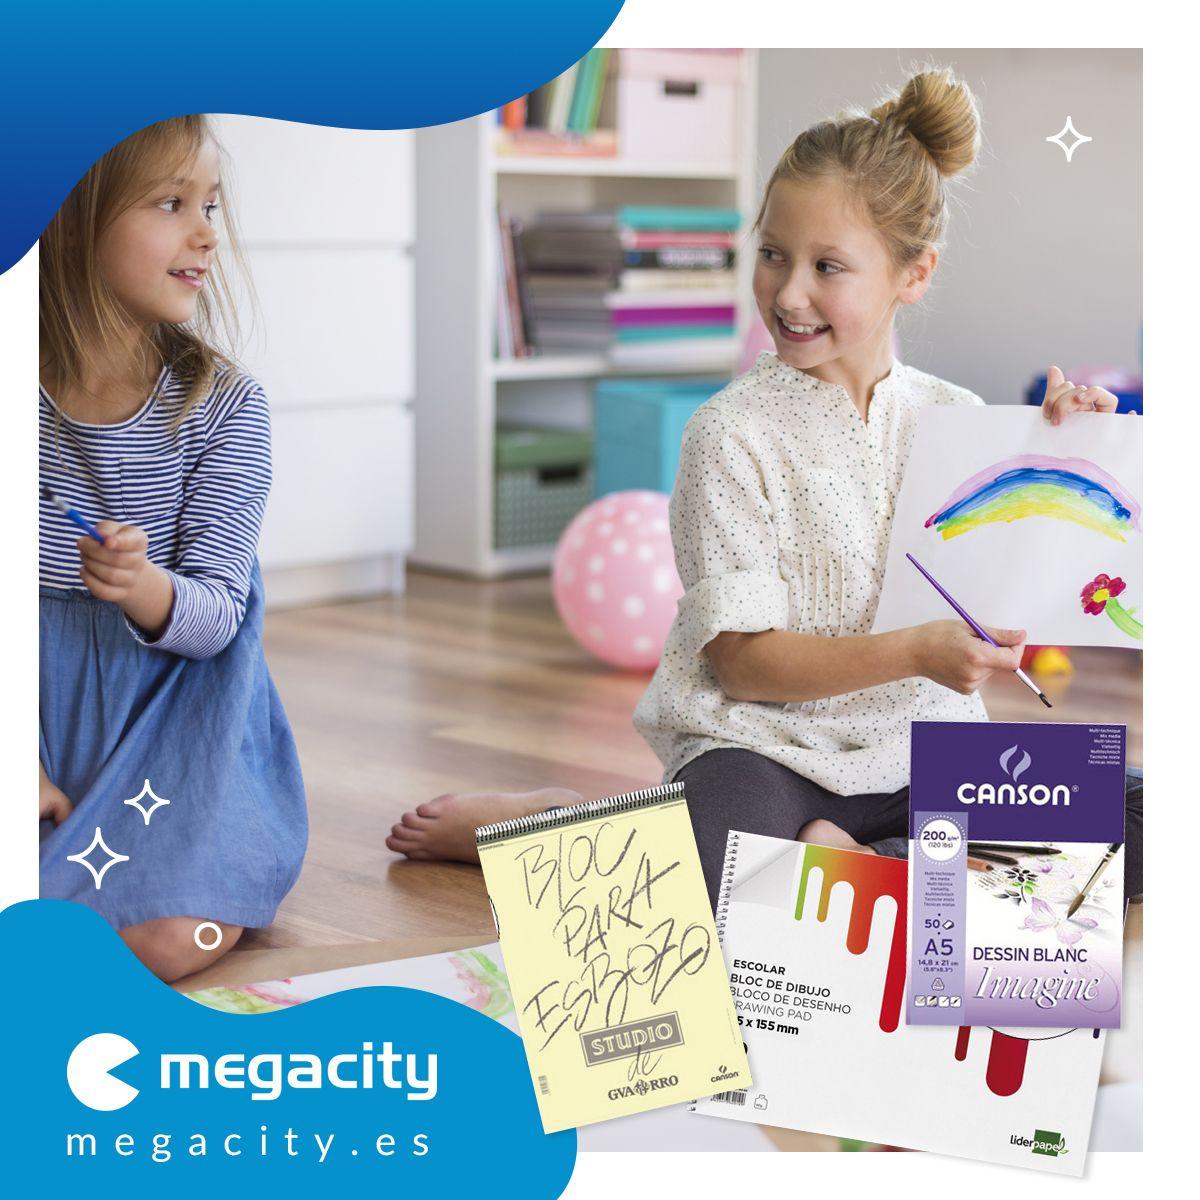 Conseguir blocs de dibujo personalizados en Megacity